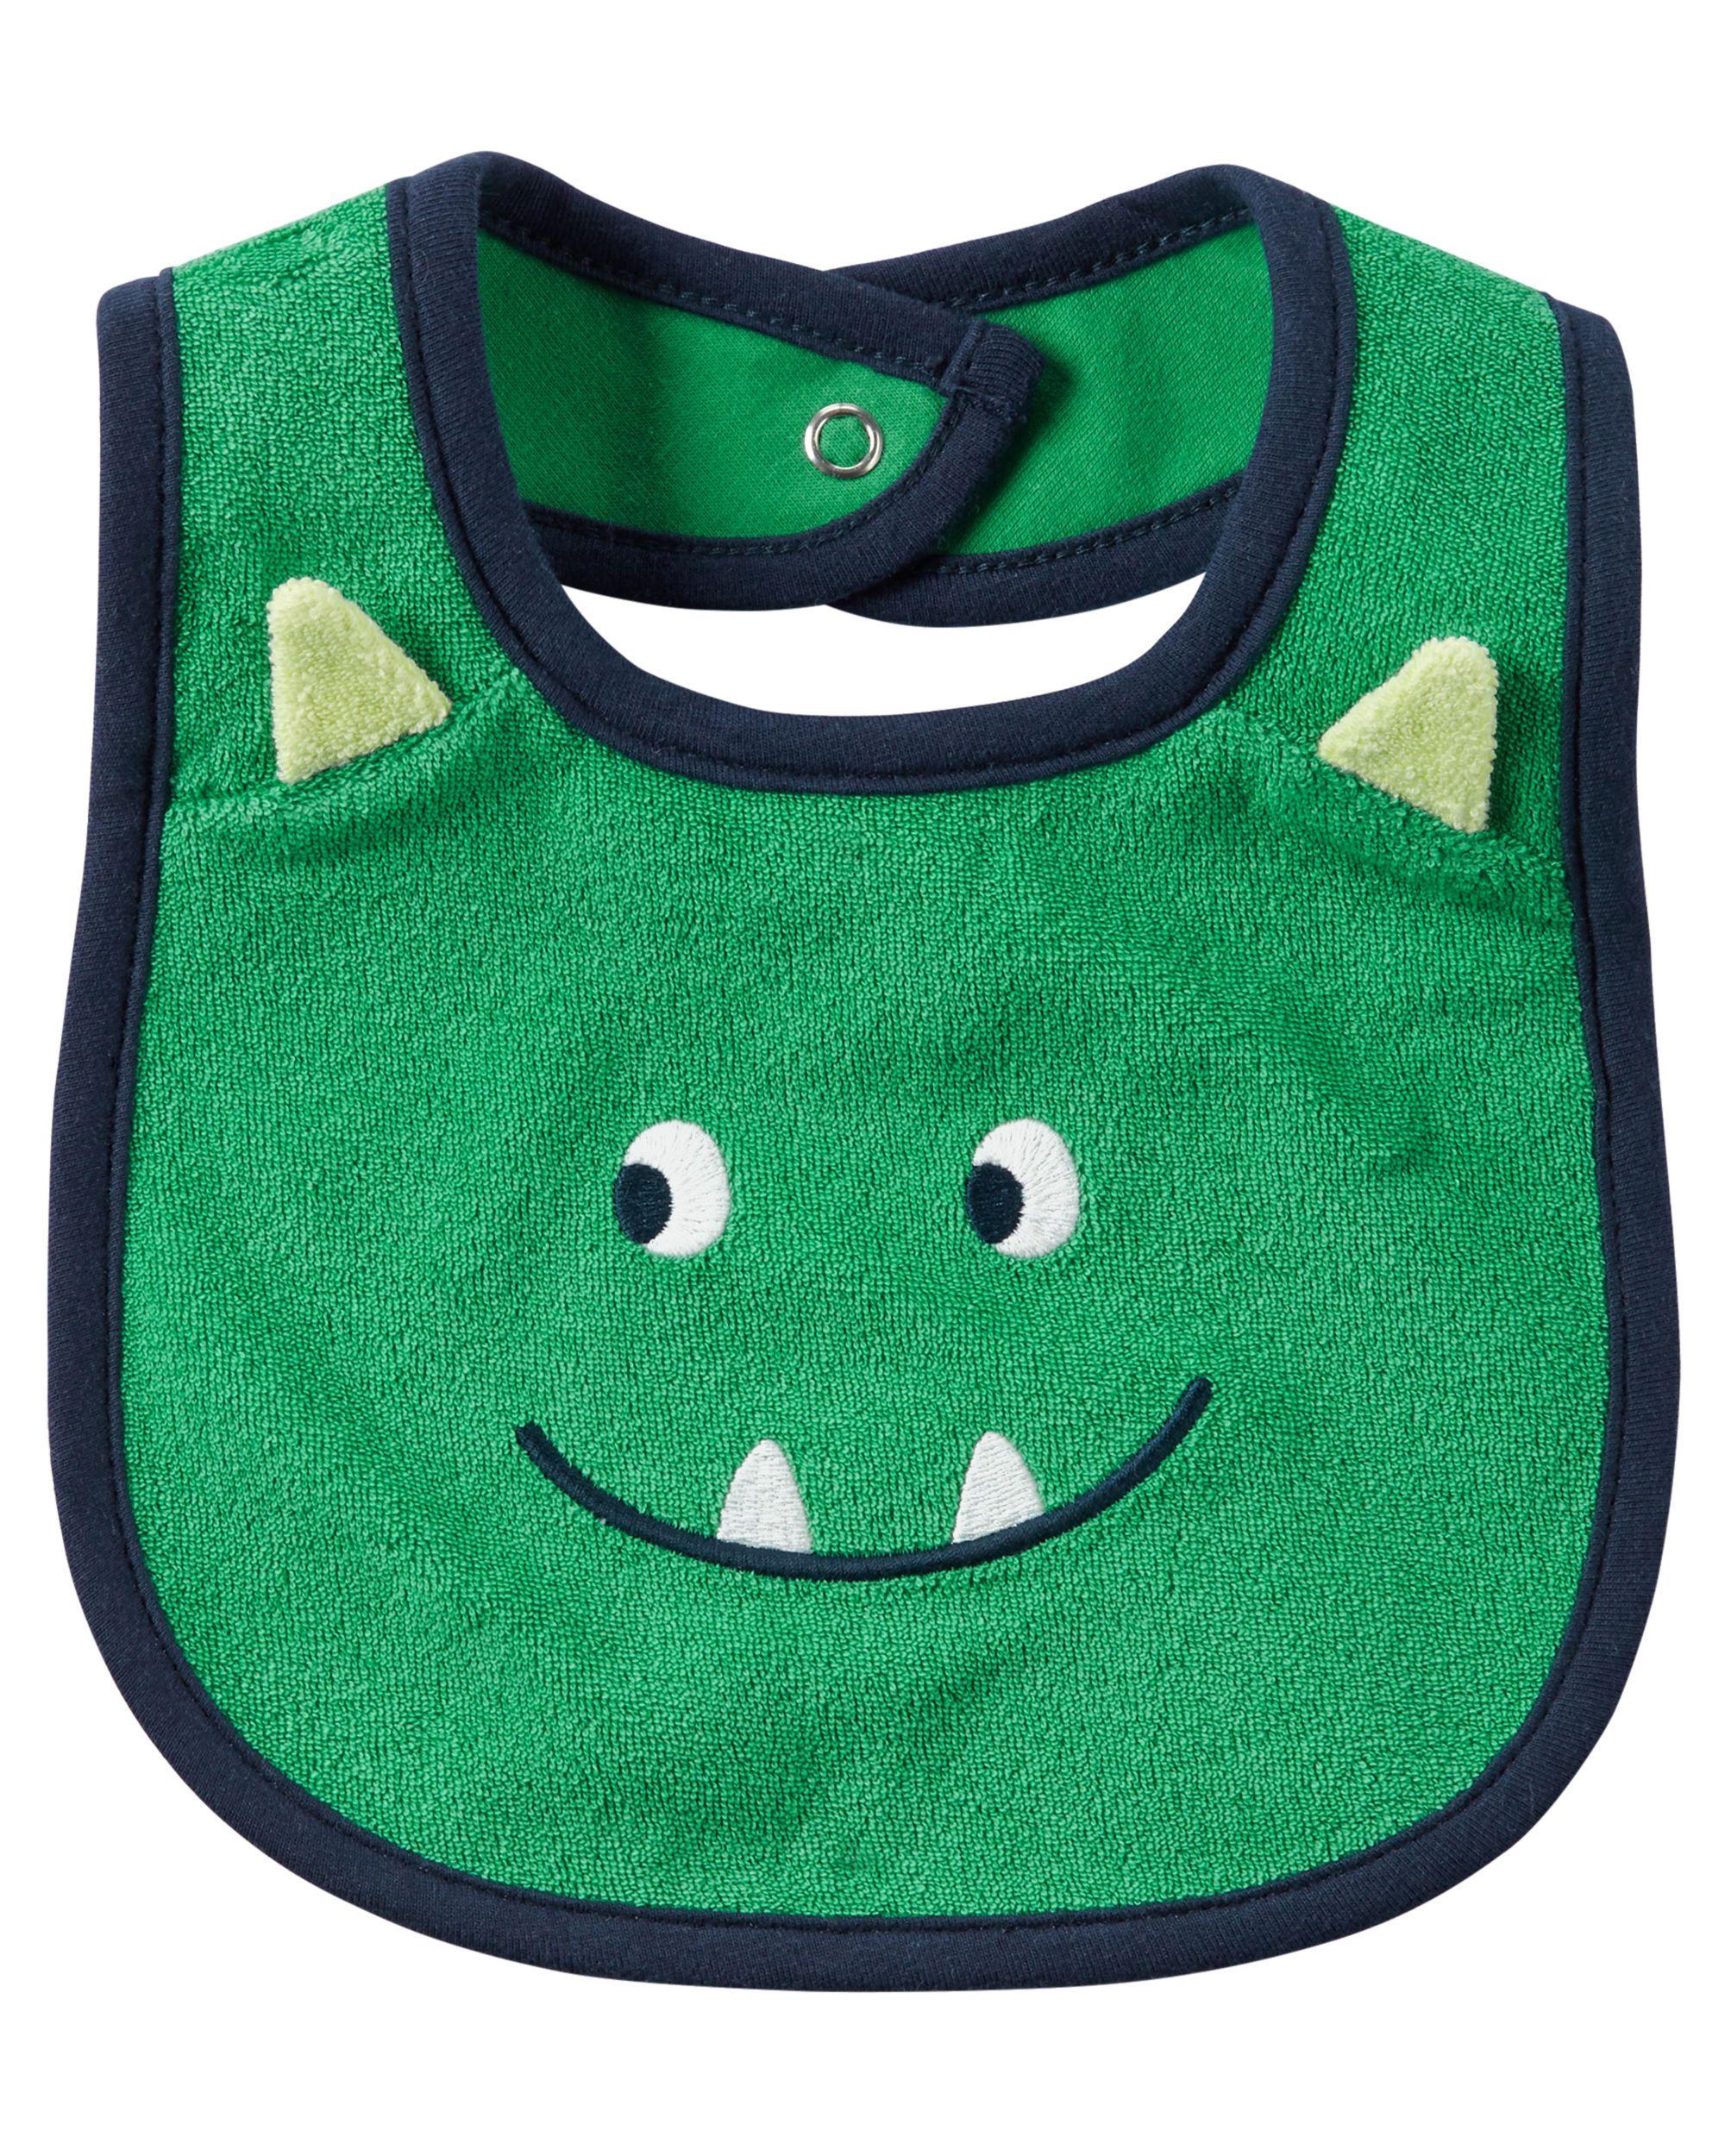 936503e4e Baby Boy Monster Teething Bib   Carters.com   Baby   Teething bibs ...